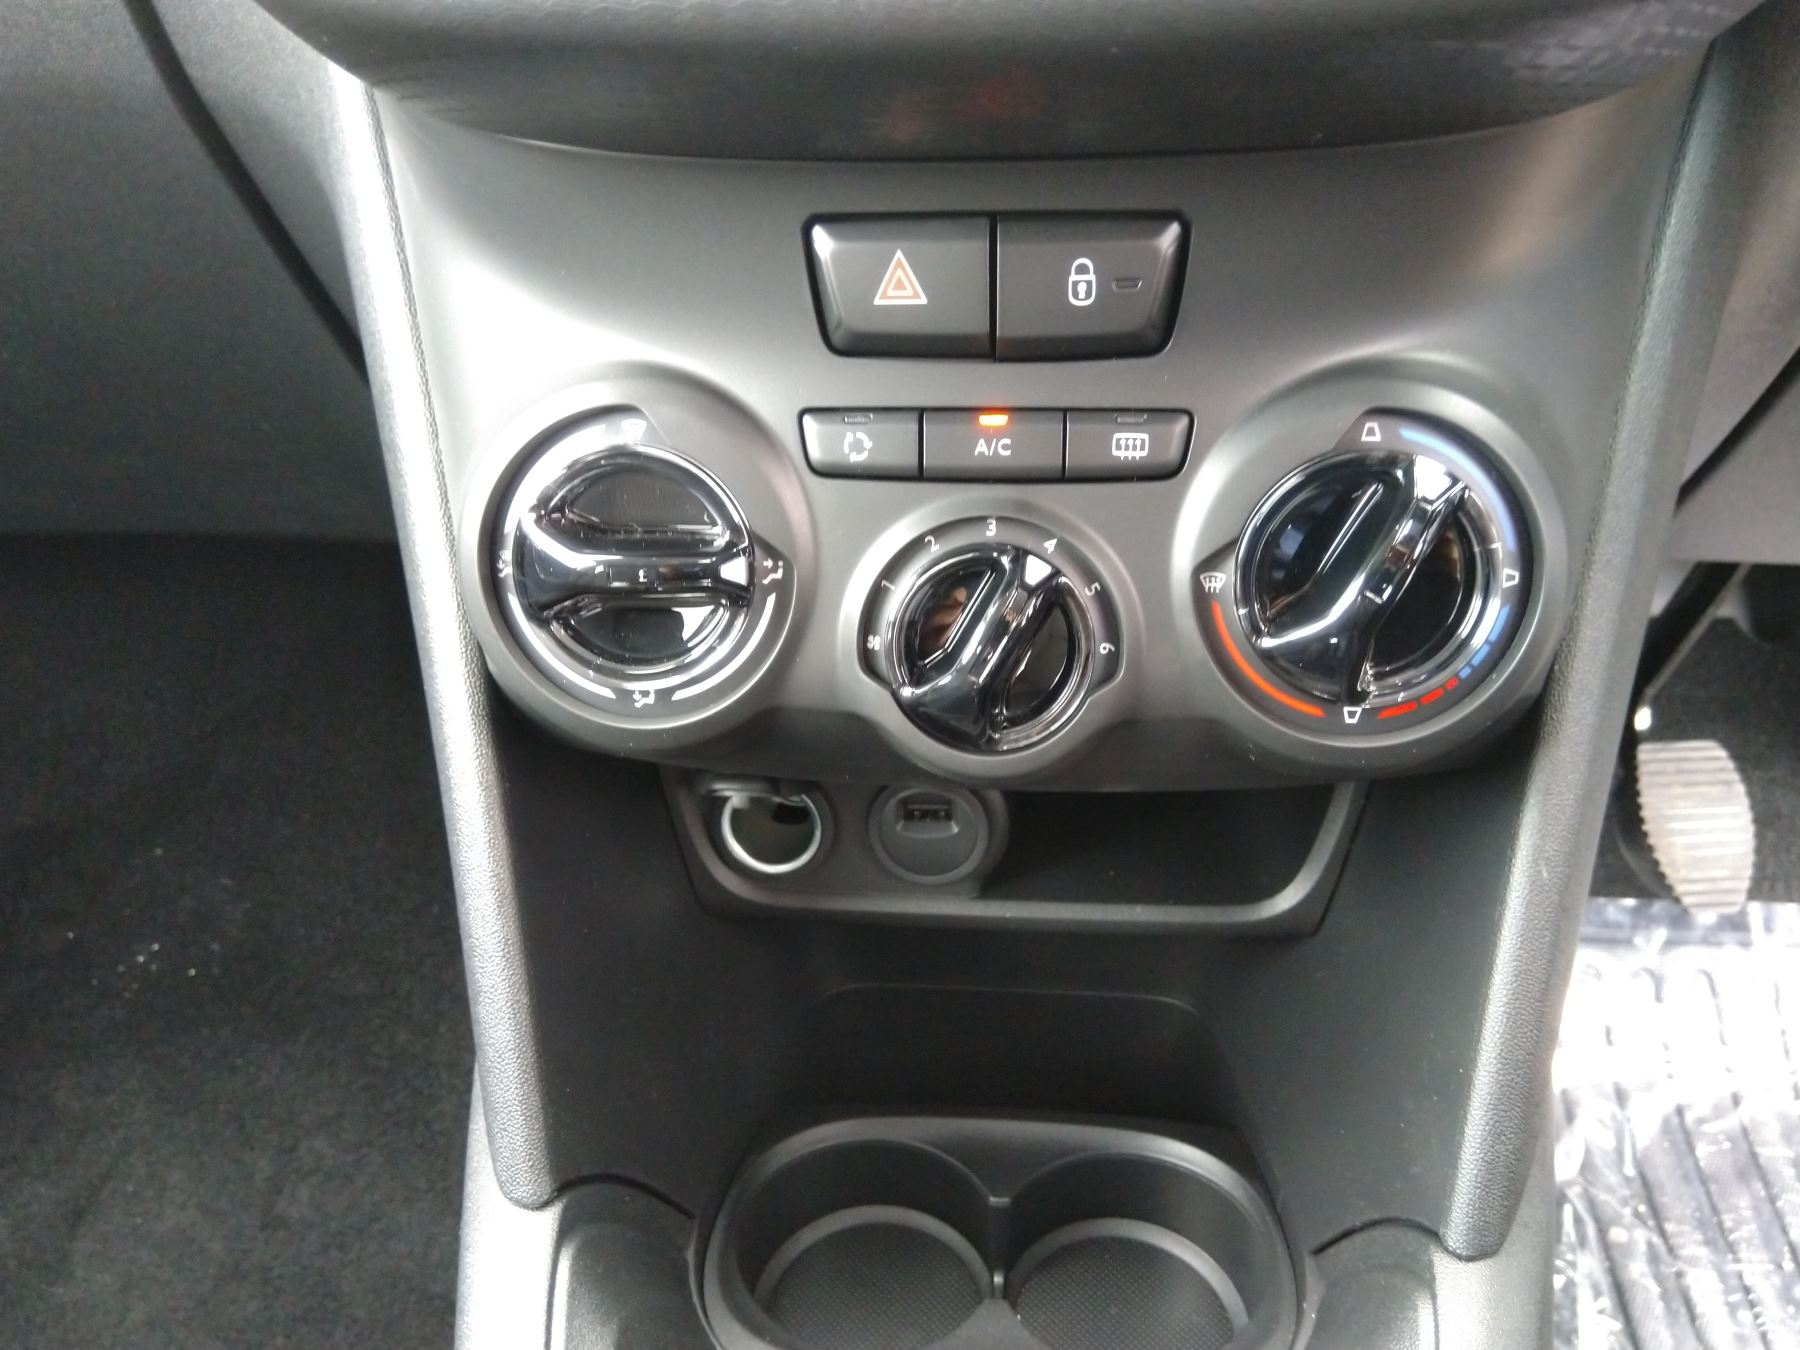 Peugeot 208 1.2 PureTech 82 Signature [Start Stop] image 6